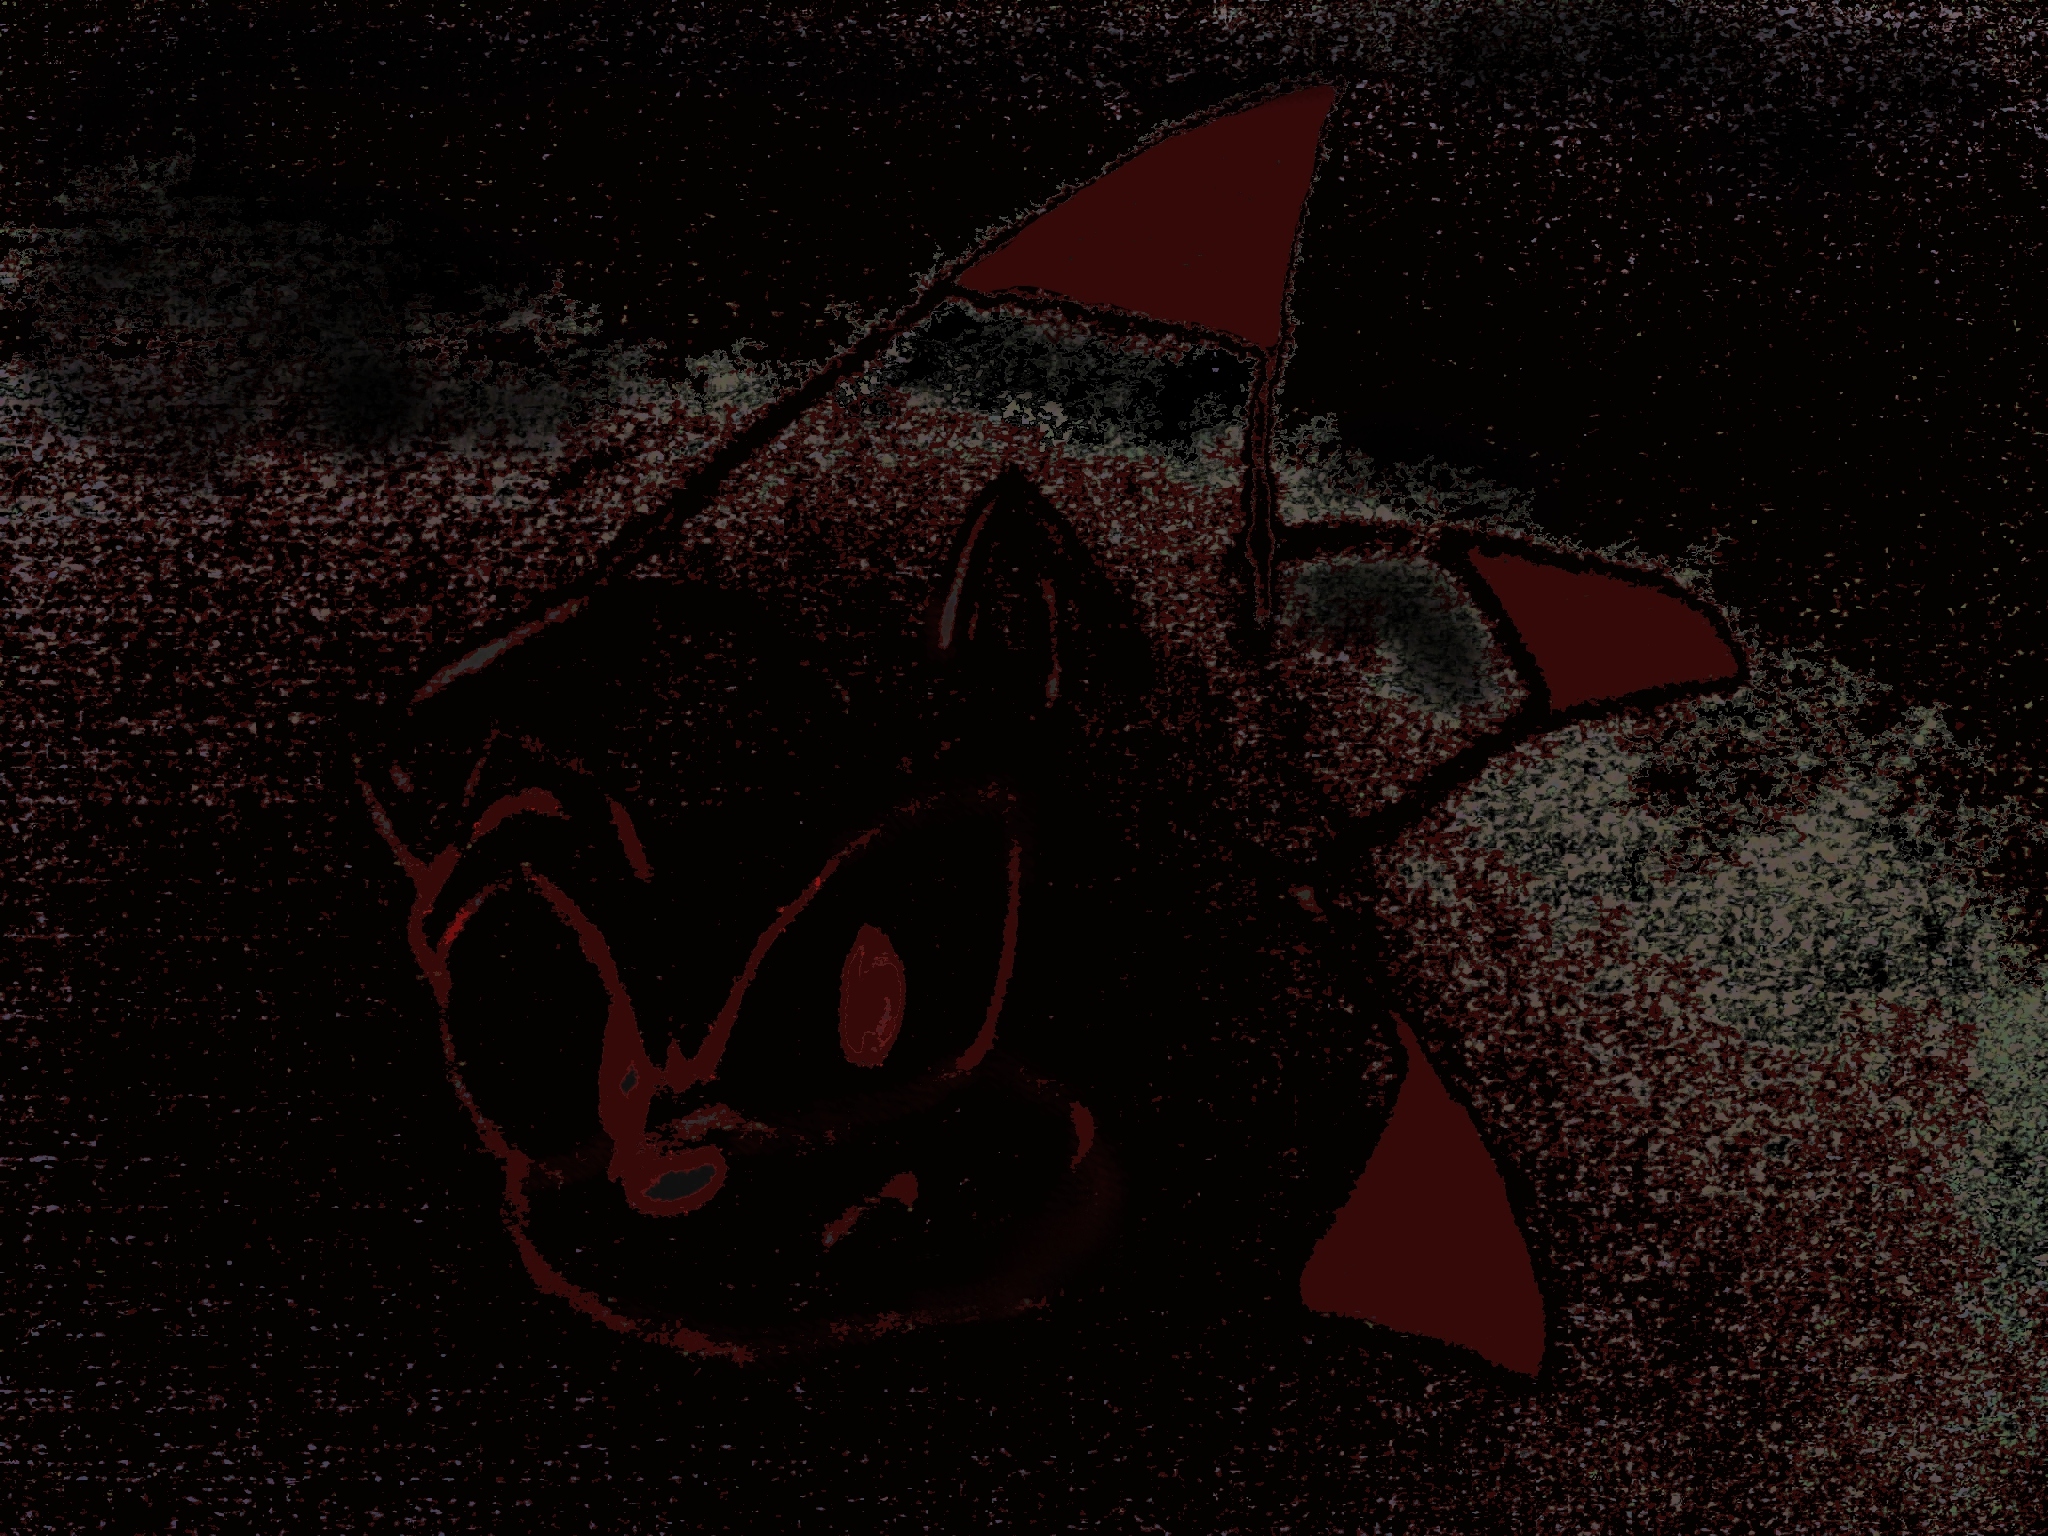 Nightmare Hedgehog